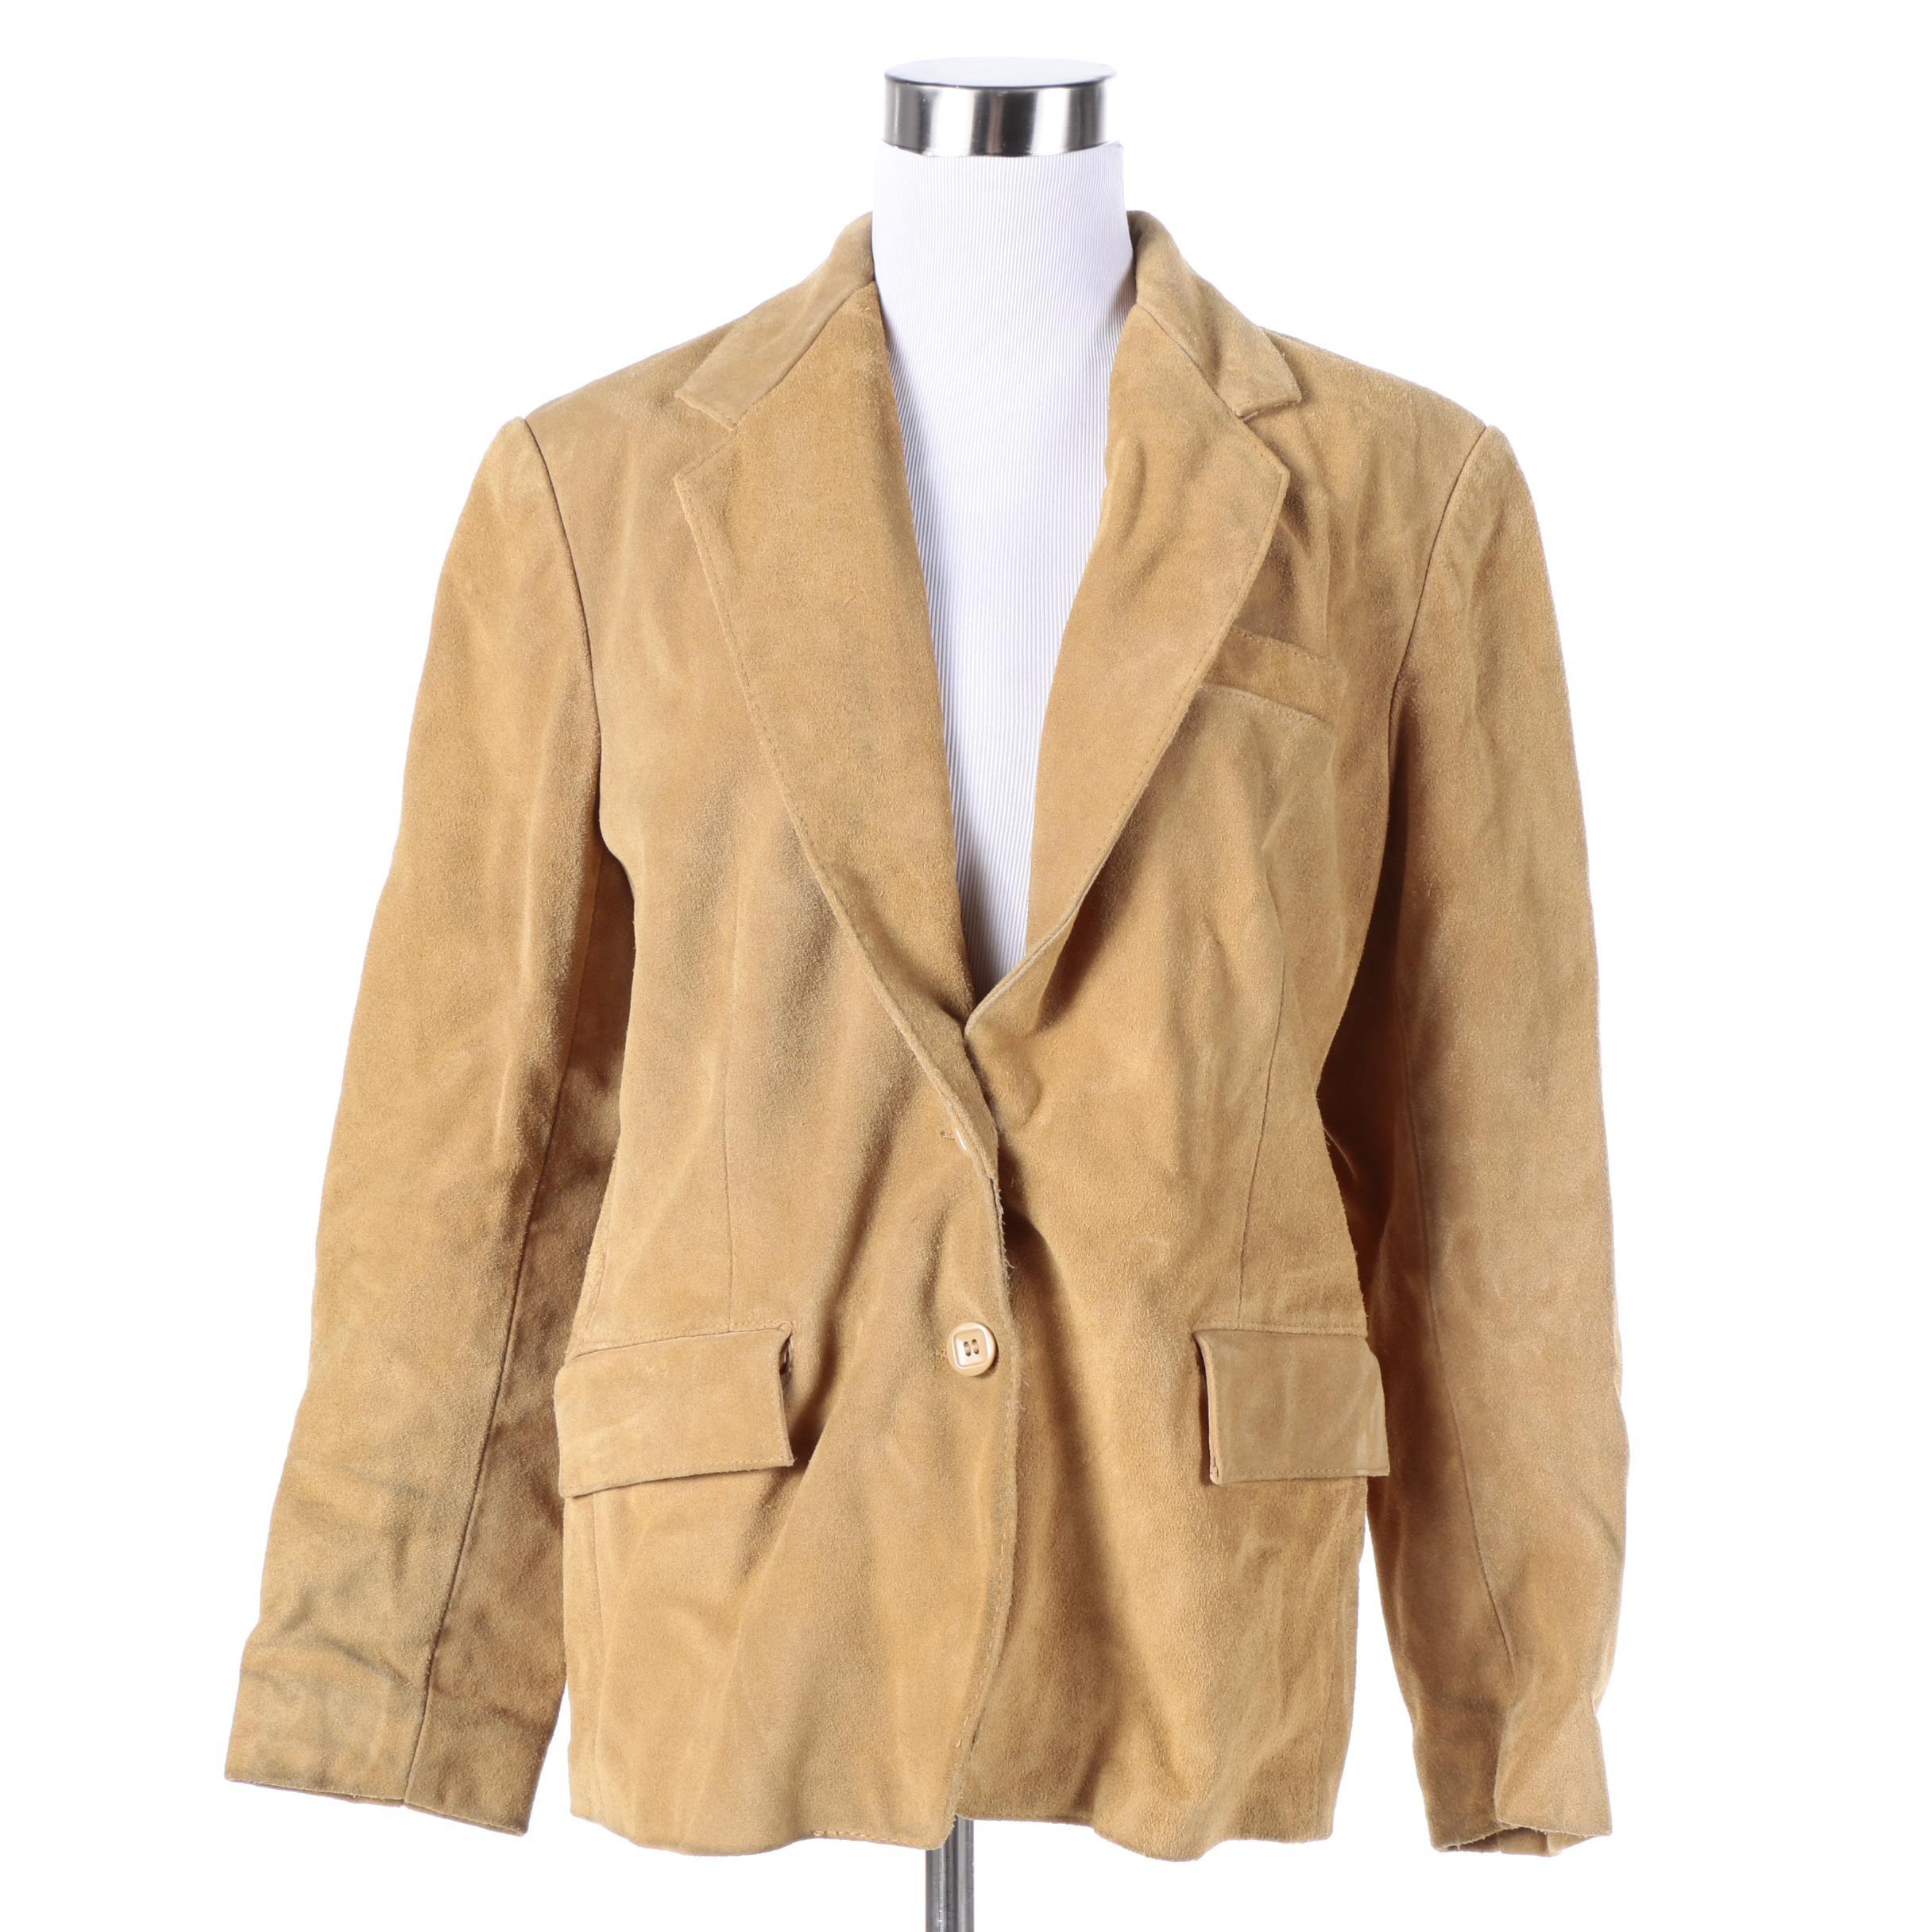 Women's Vintage Carla Tan Suede Jacket